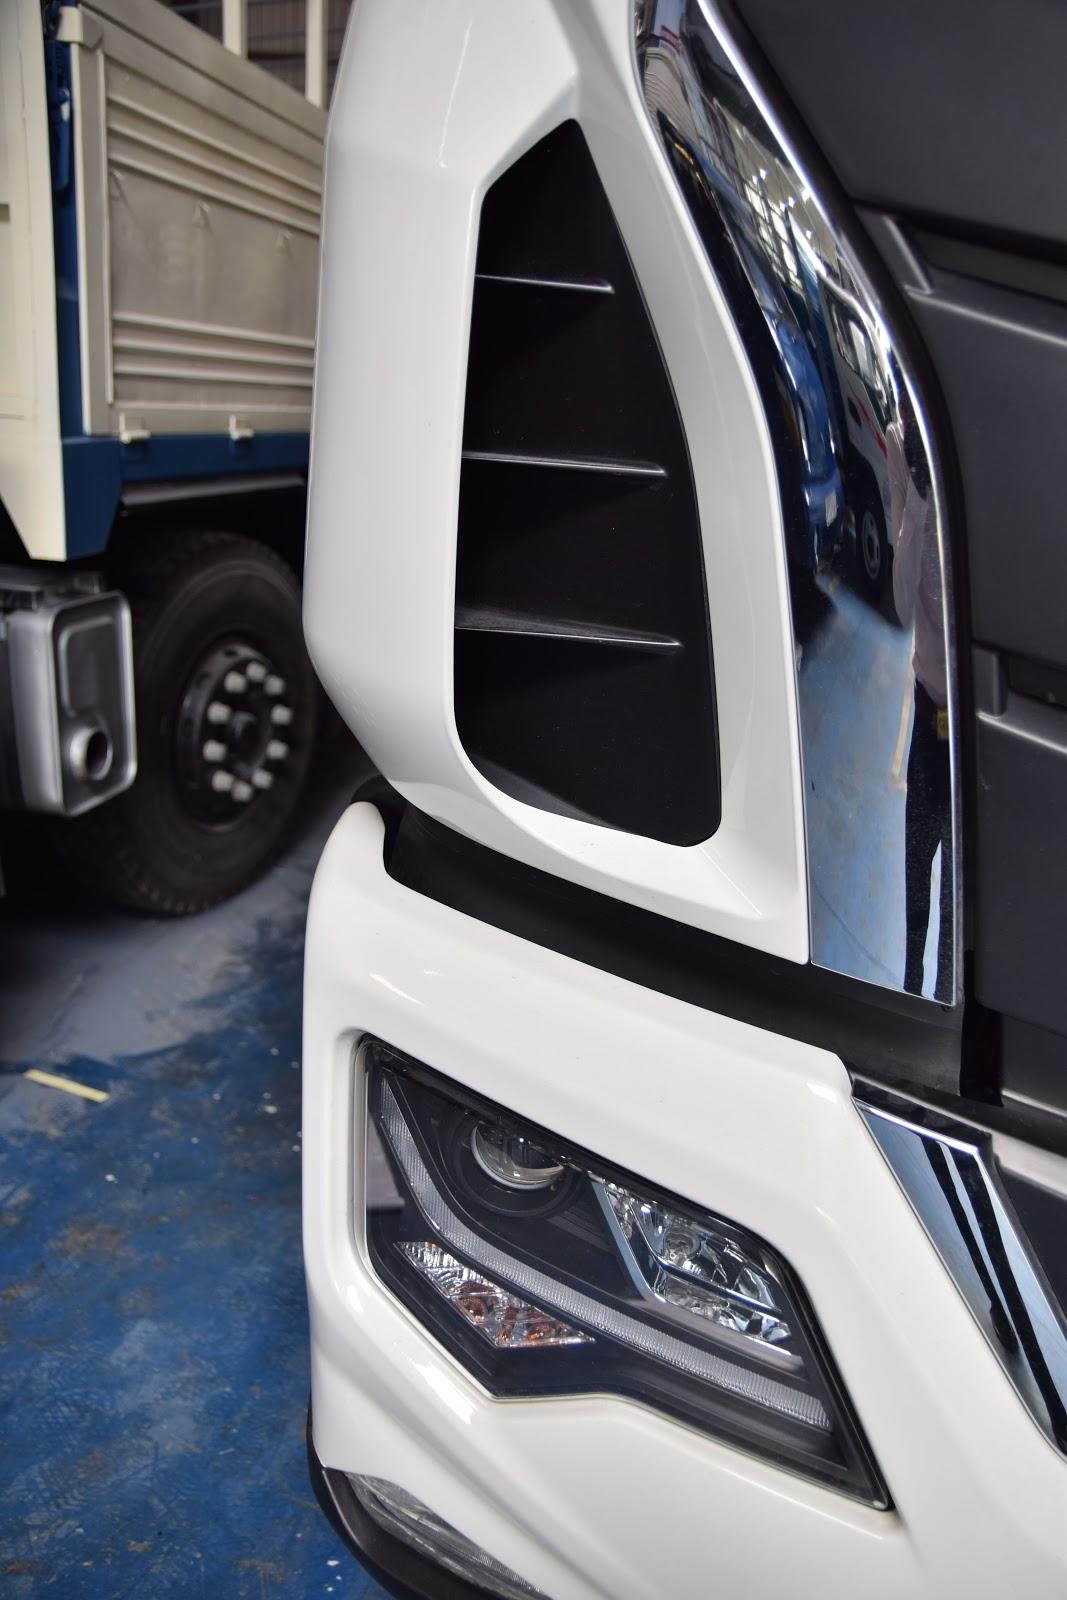 xe-tải-jac-5-chân-k5 (2).jpg